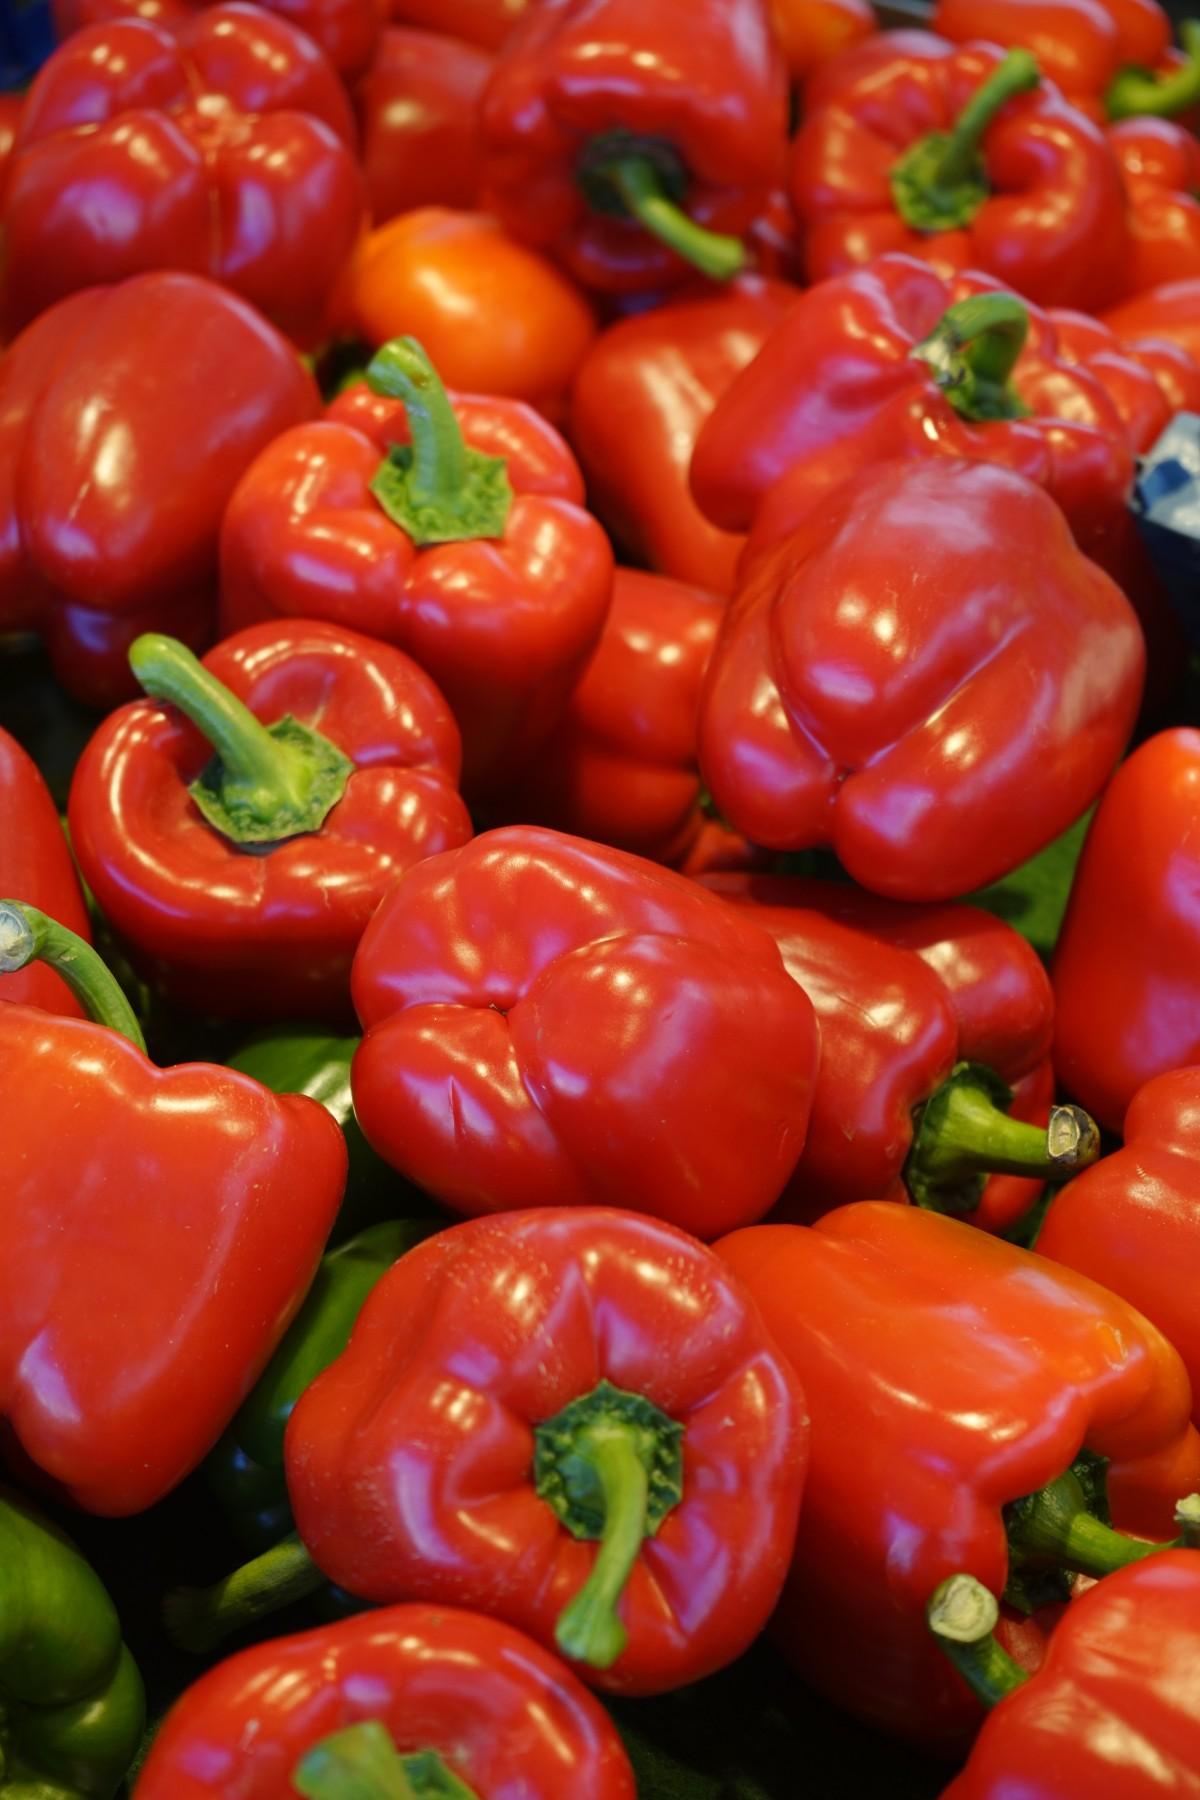 Free Images : fruit, food, produce, vegetable, vegetables ...